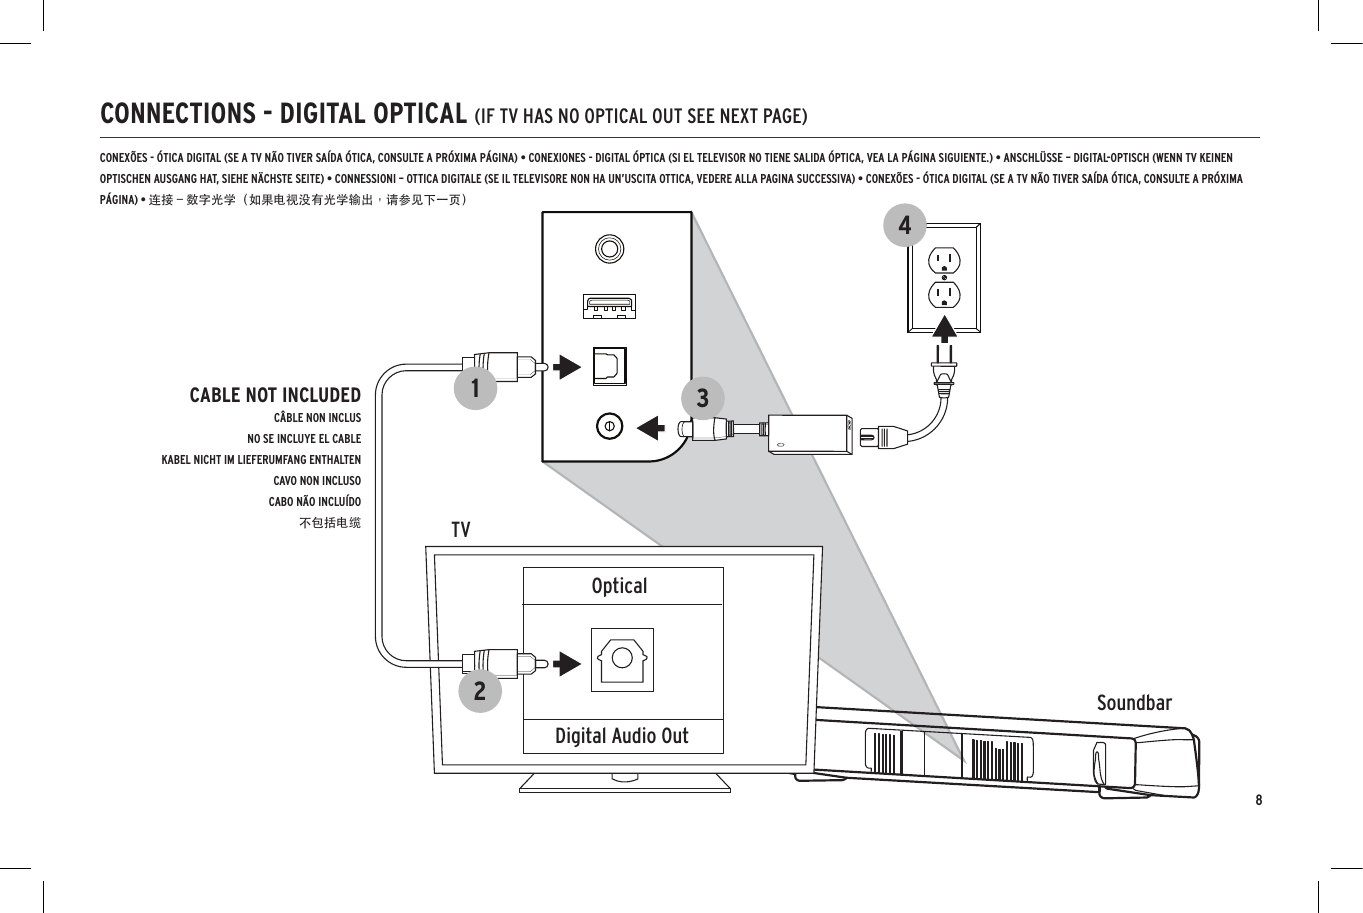 panasonic sound bar instruction manual